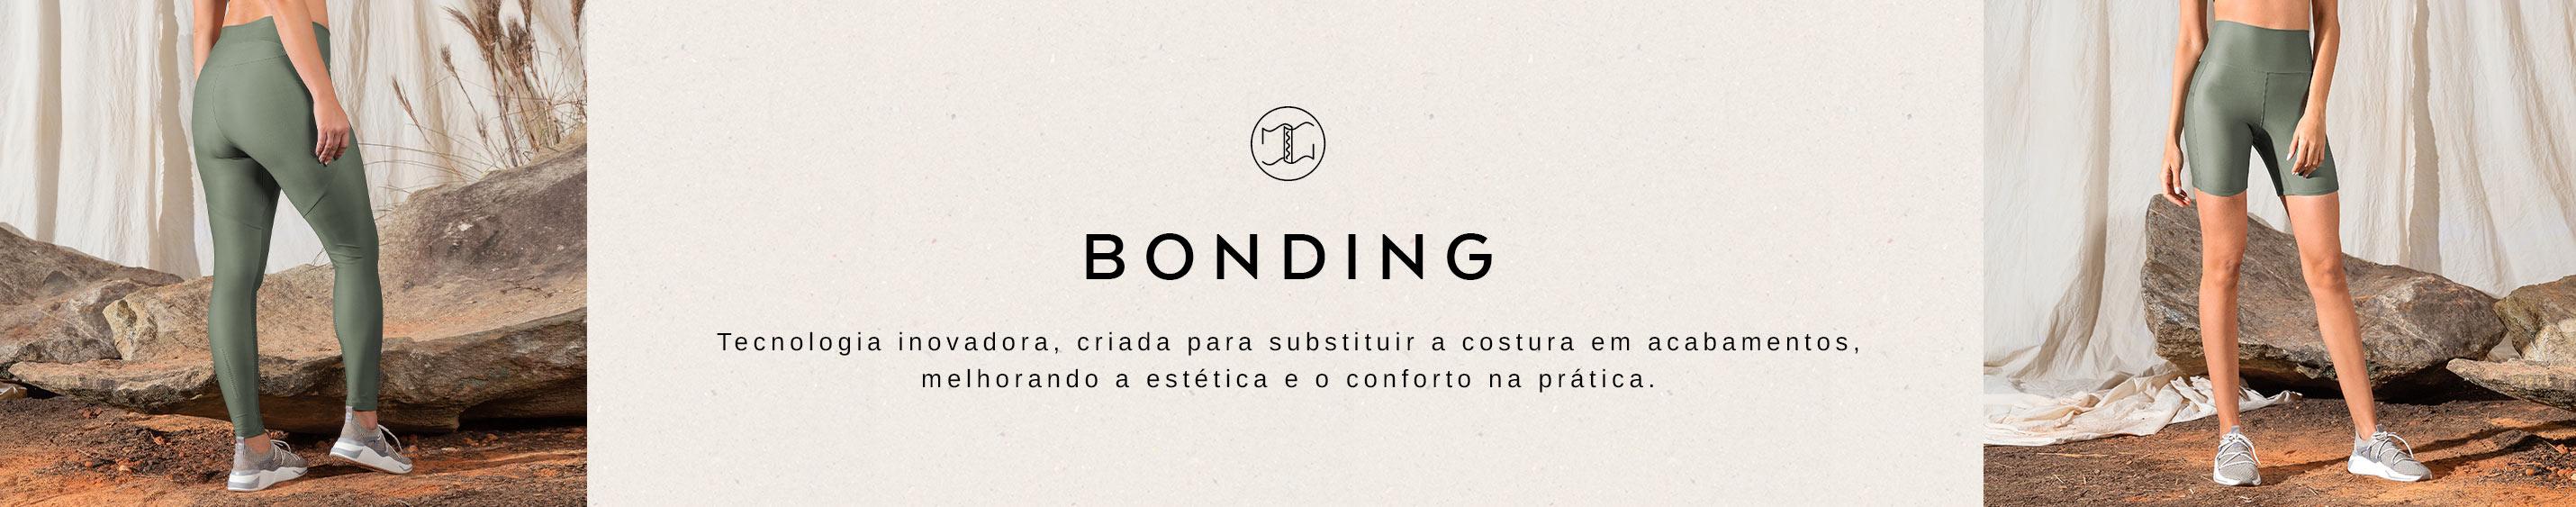 banner_tecnologia_bonding